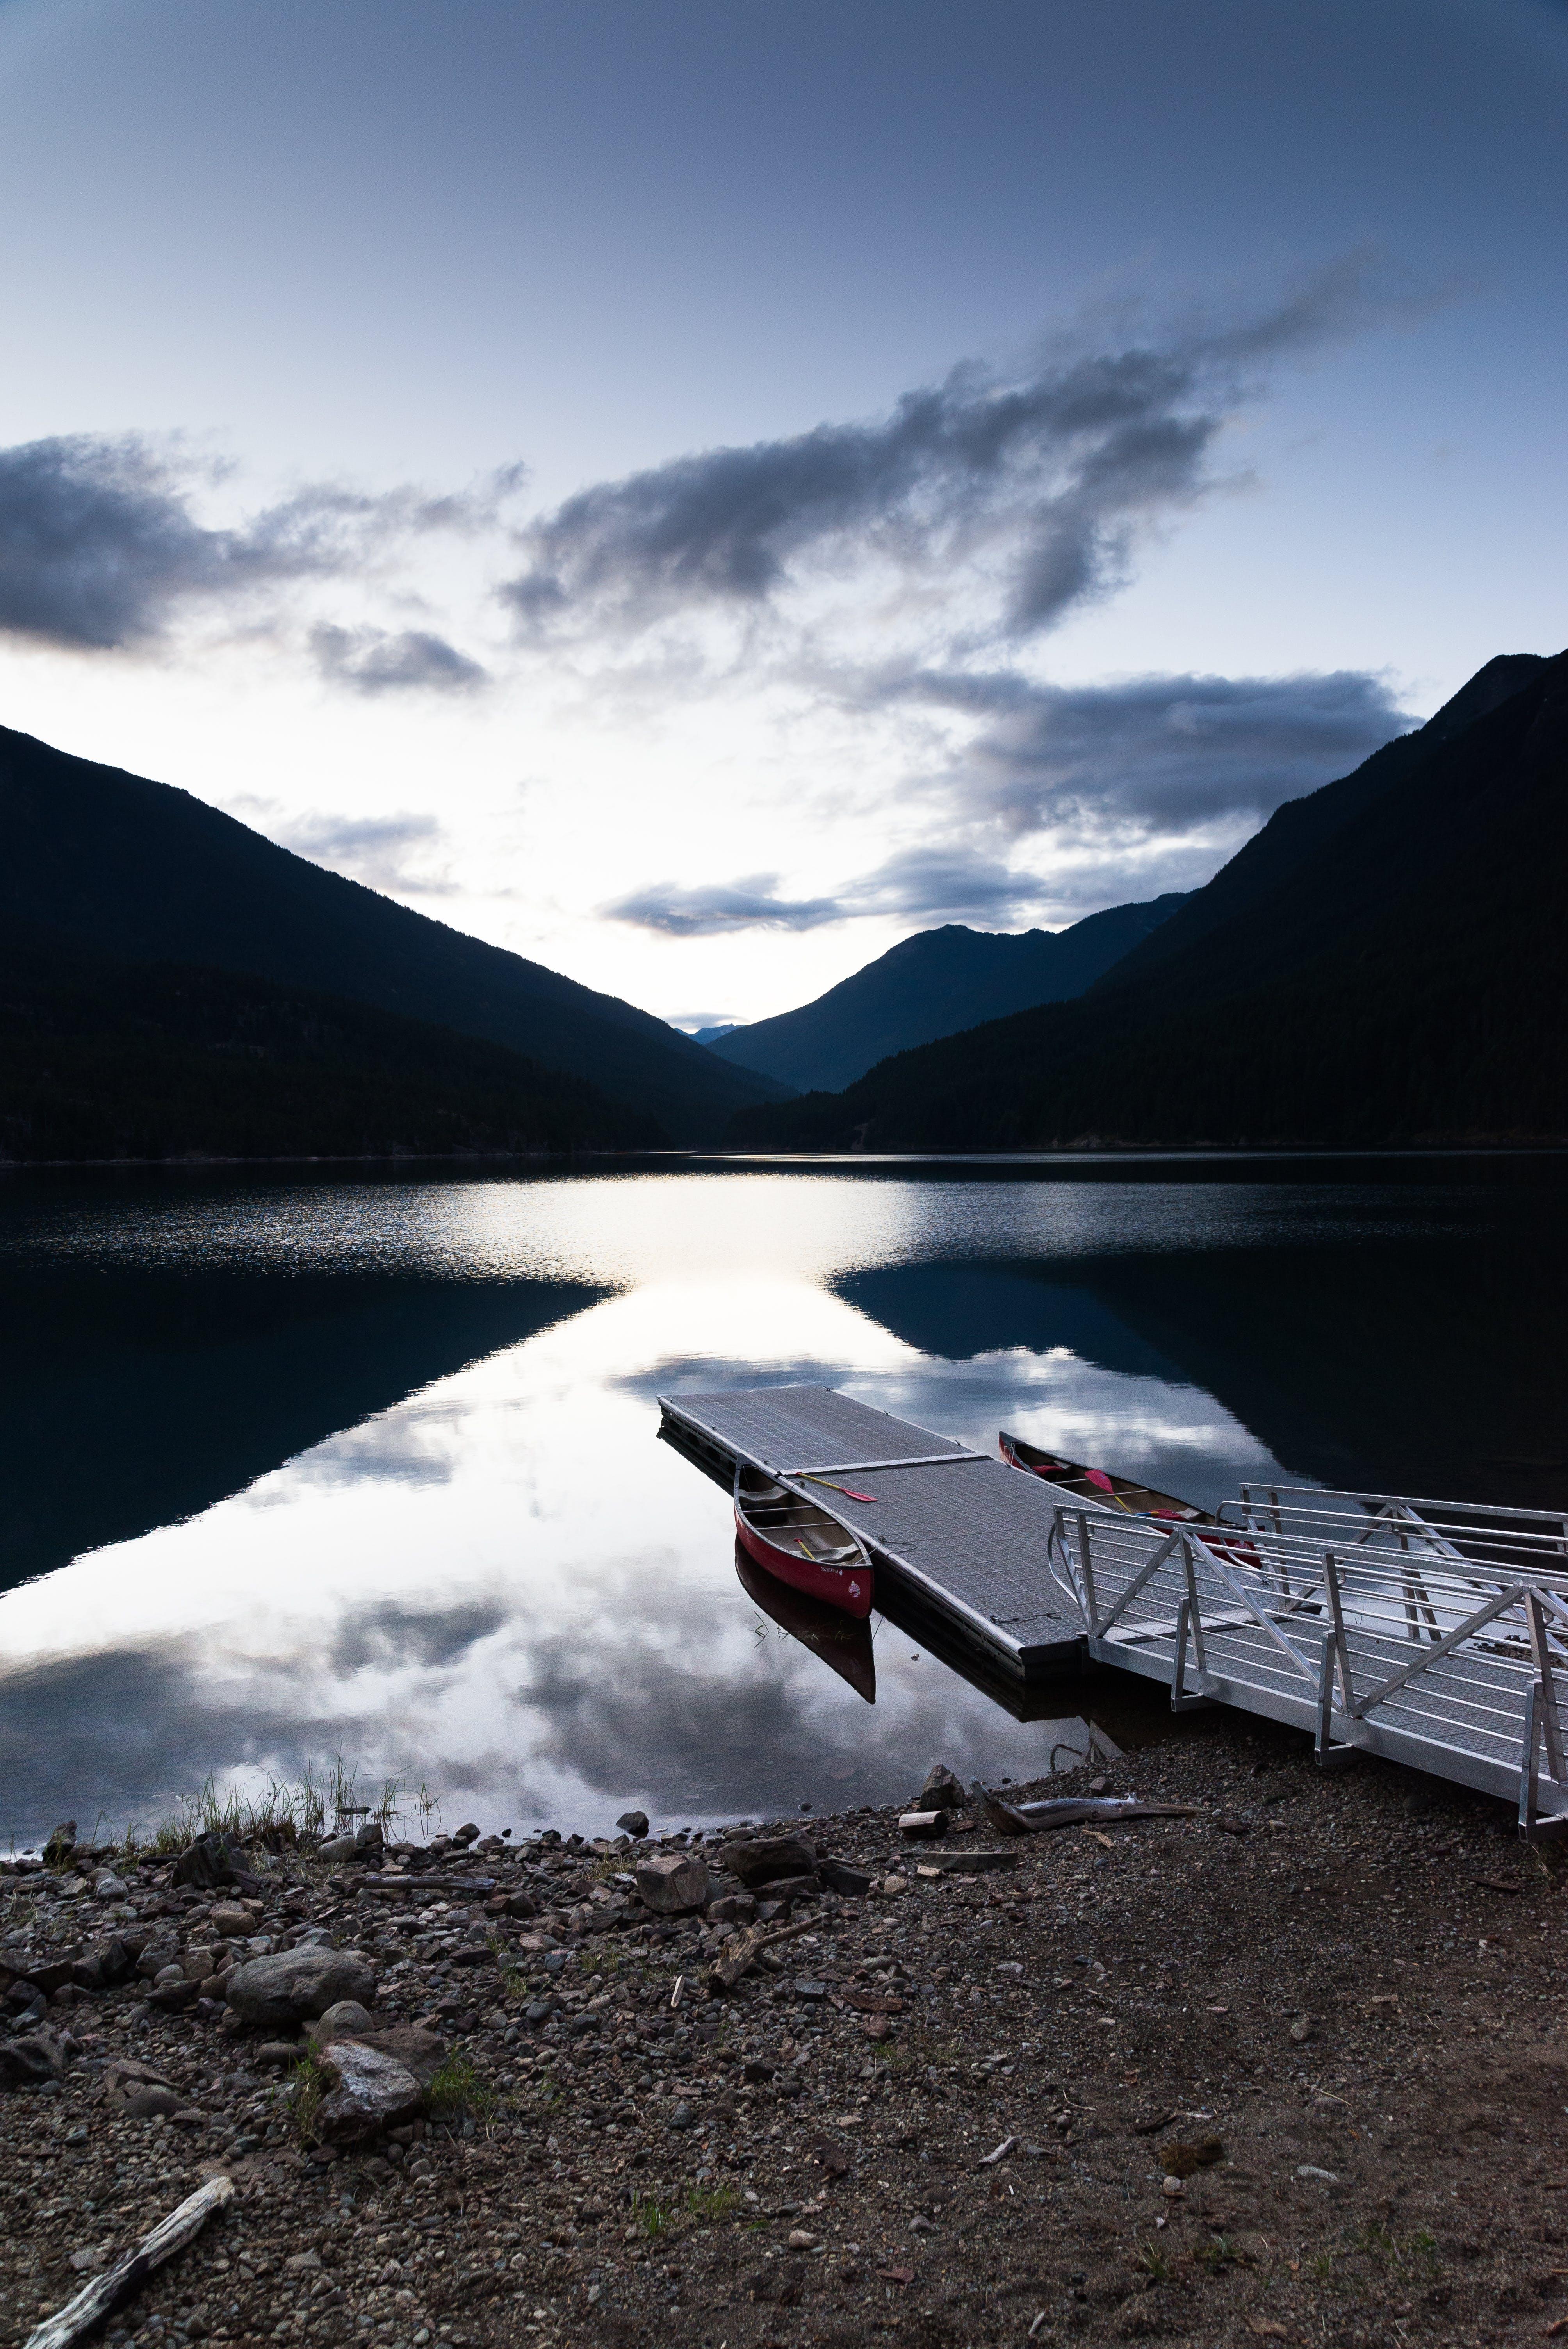 Free stock photo of lake, dock, canoe